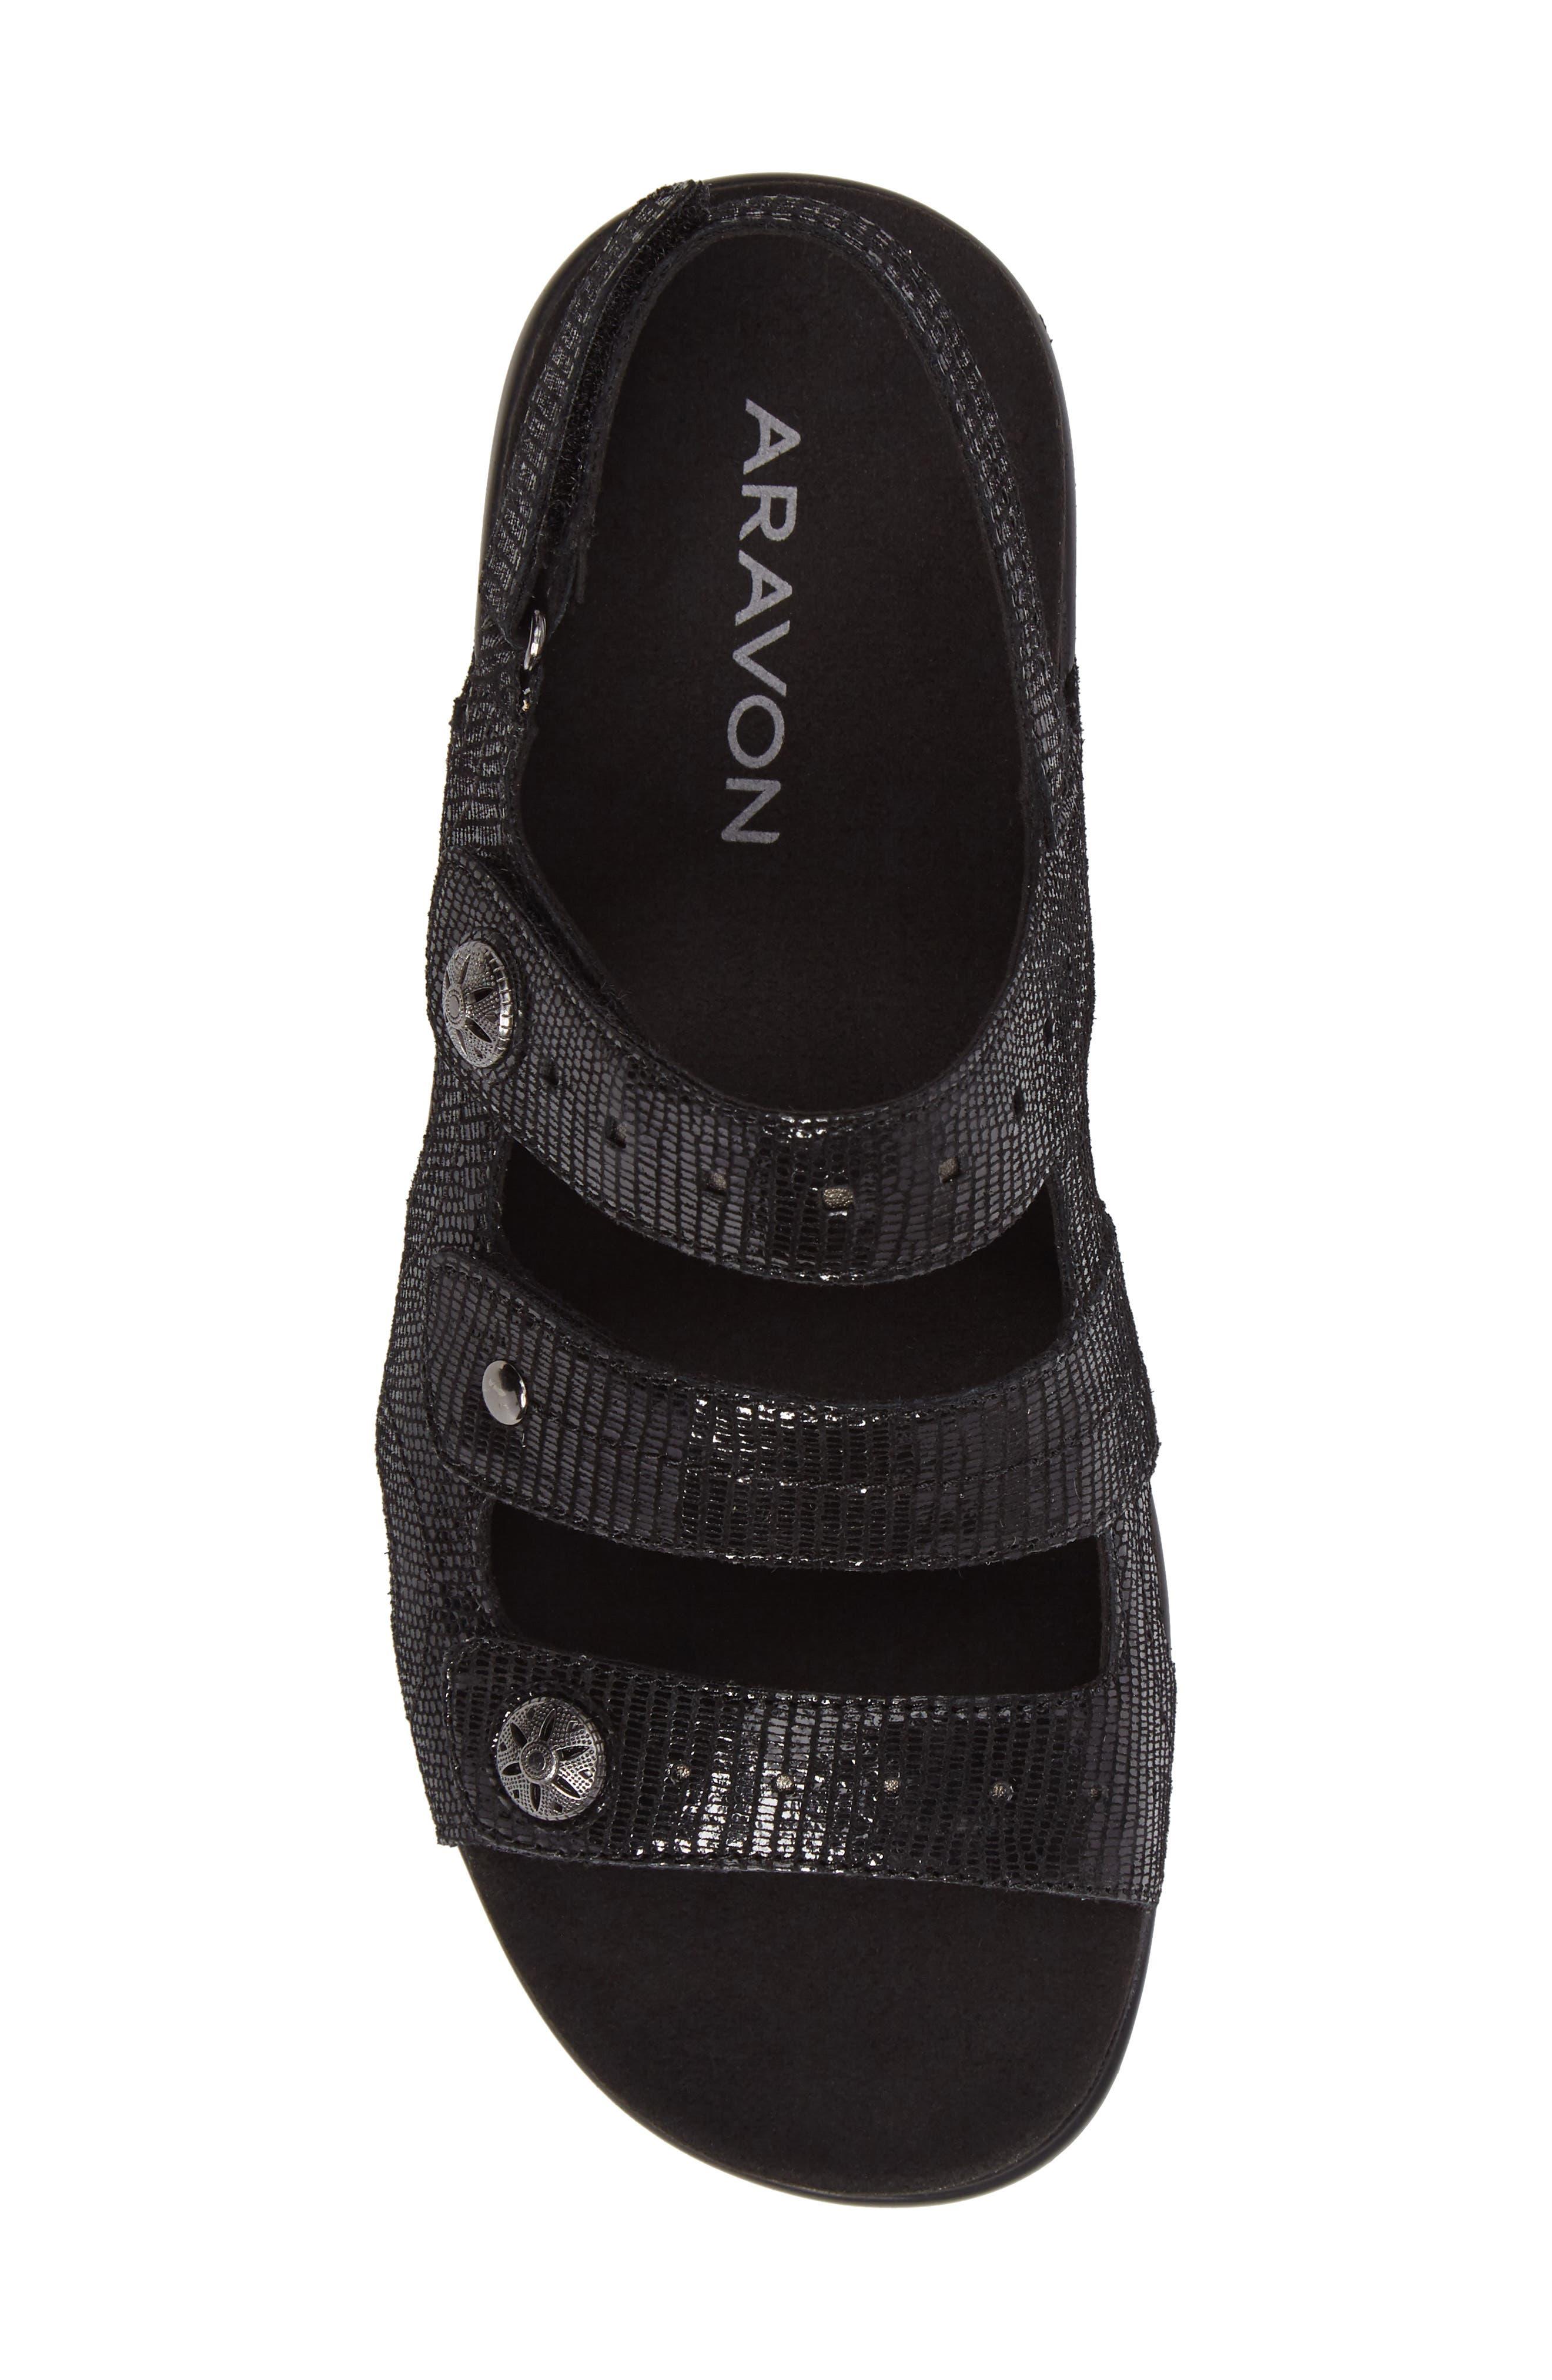 PC Wedge Sandal,                             Alternate thumbnail 5, color,                             BLACK FABRIC